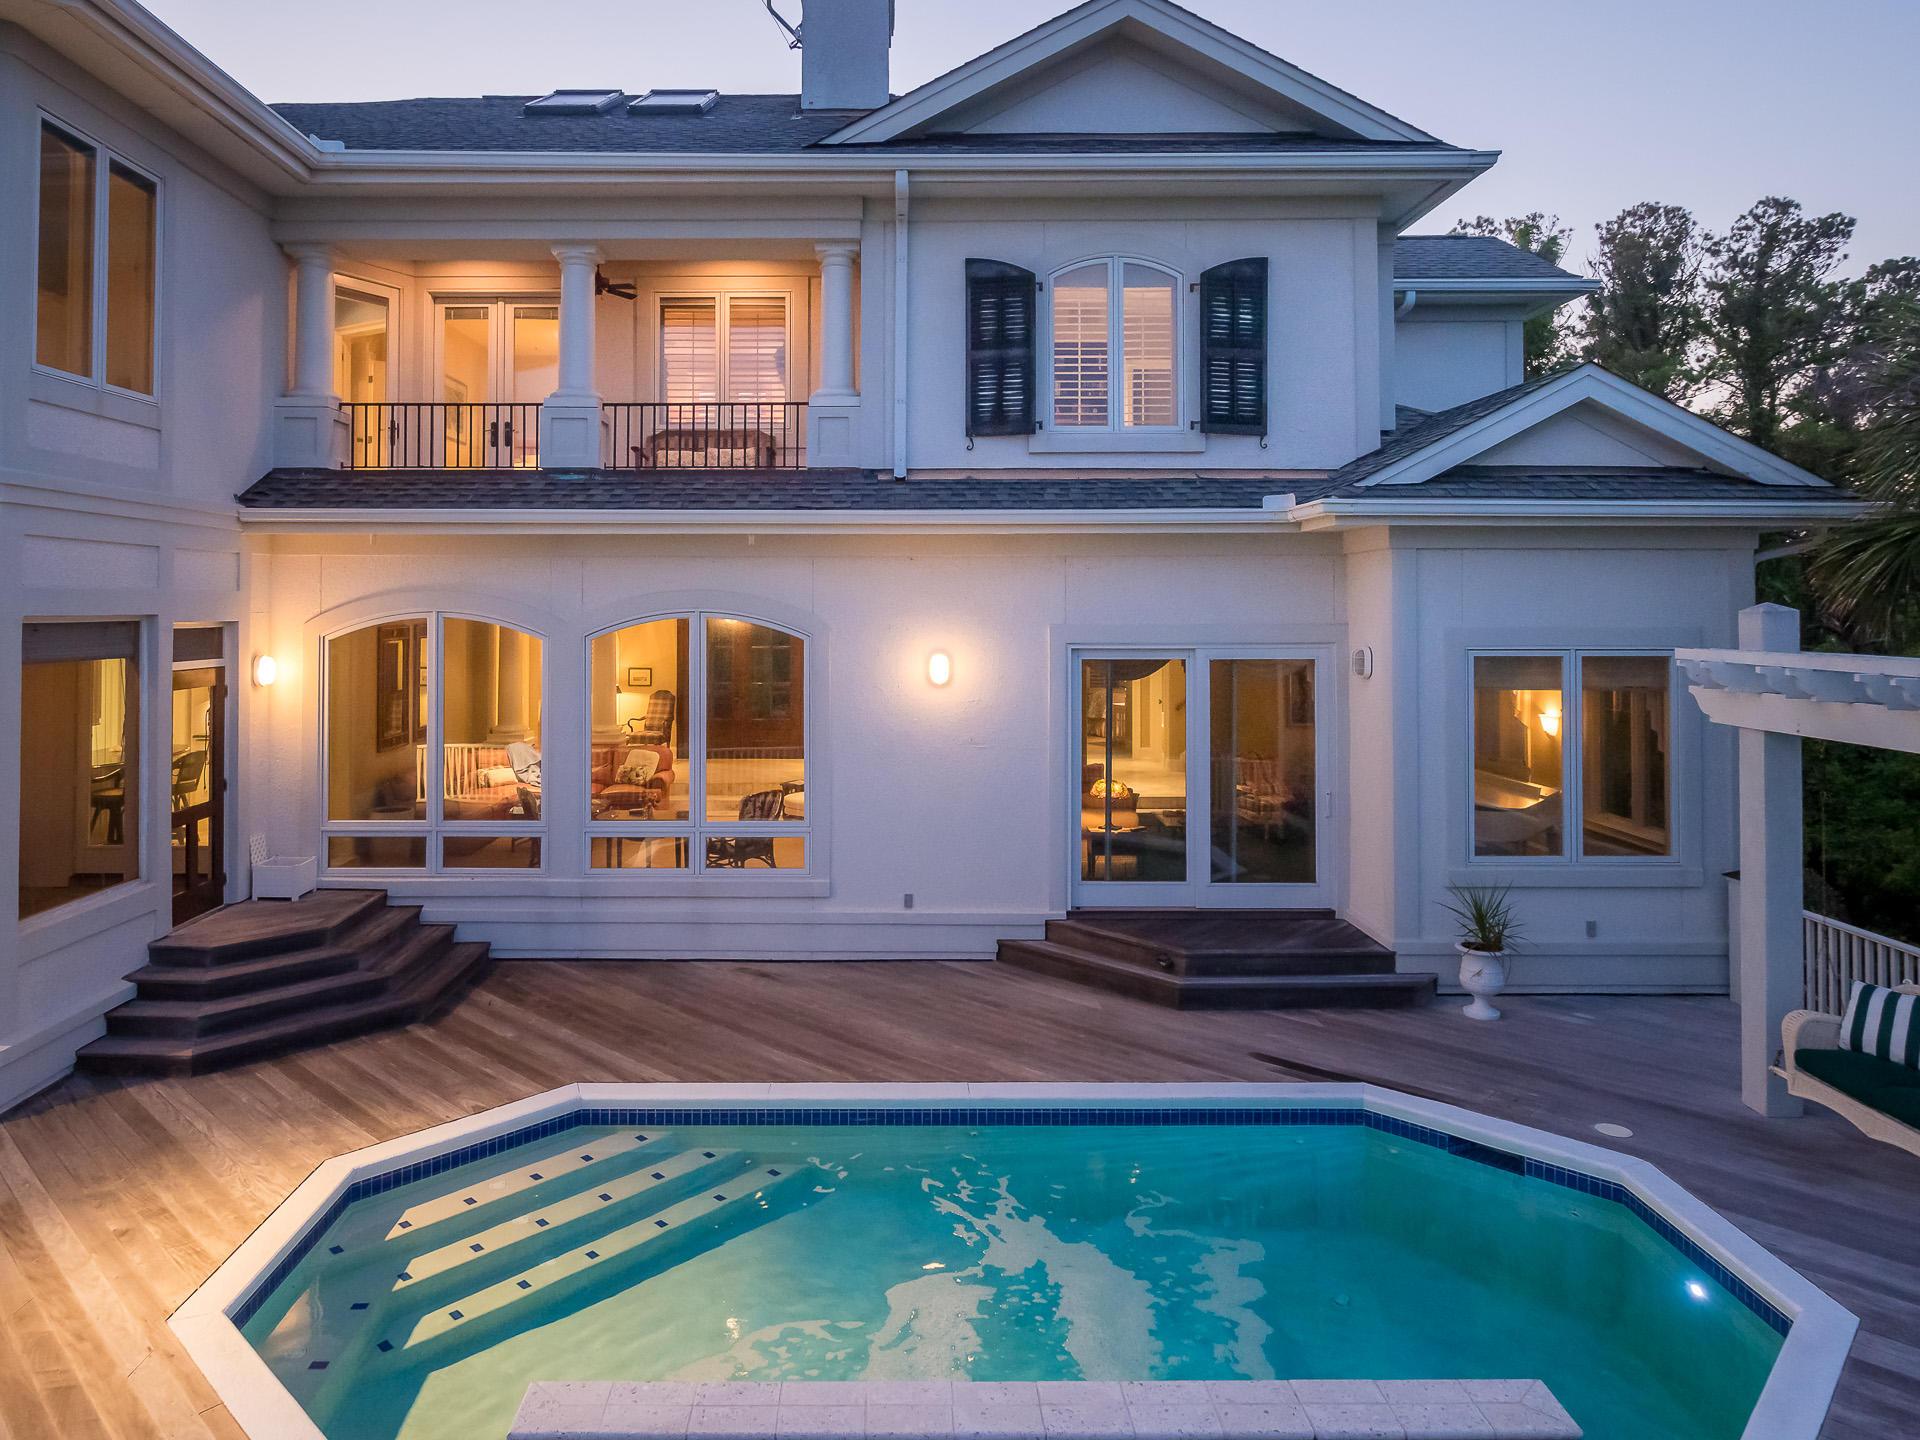 Seabrook Island Homes For Sale - 2216 Rolling Dune, Seabrook Island, SC - 10